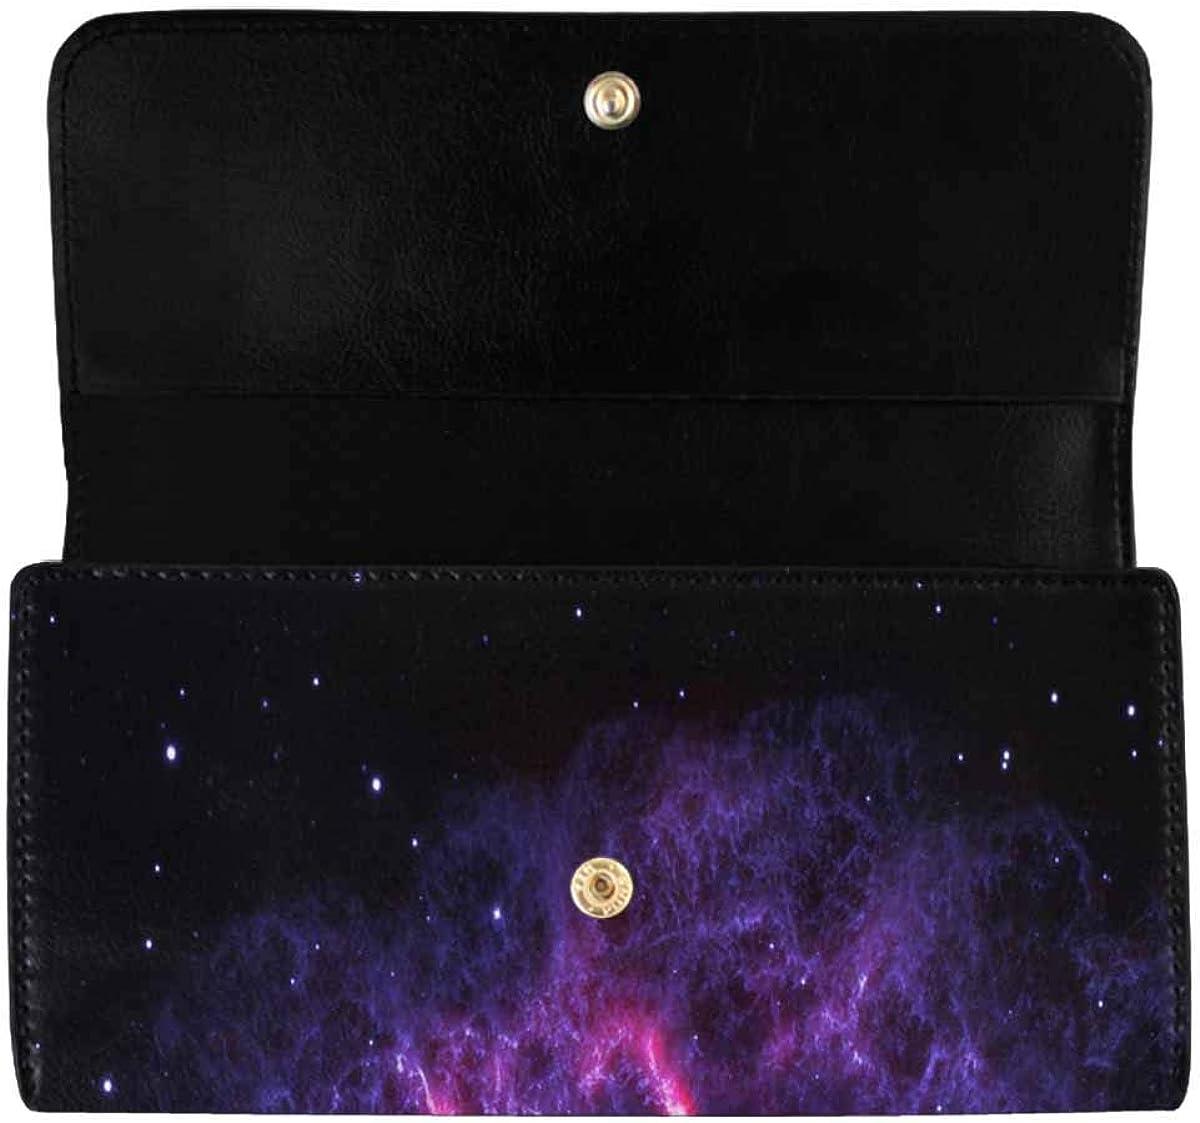 InterestPrint Women's Trifold Clutch Card Holder Watercolor Strawberries Purses Wallet Handbags